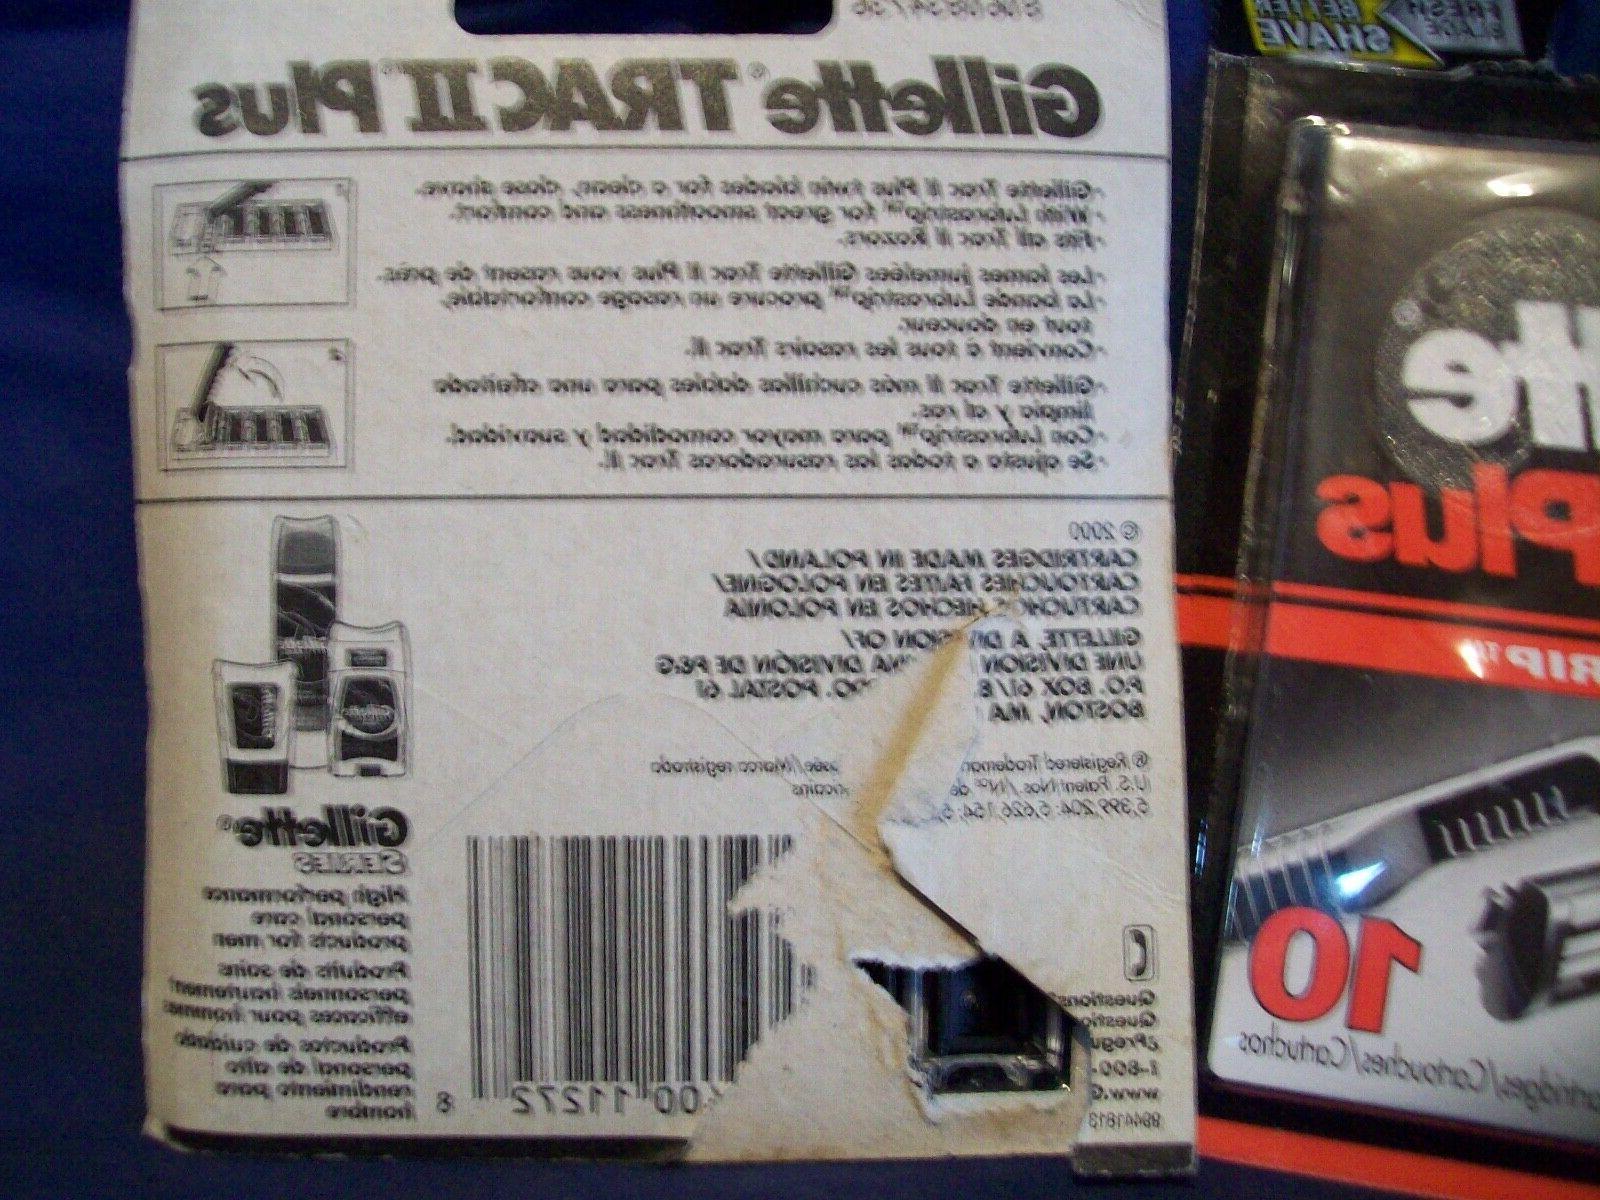 2 Packs Genuine Gillette Trac II Razor Blades Sealed-packs